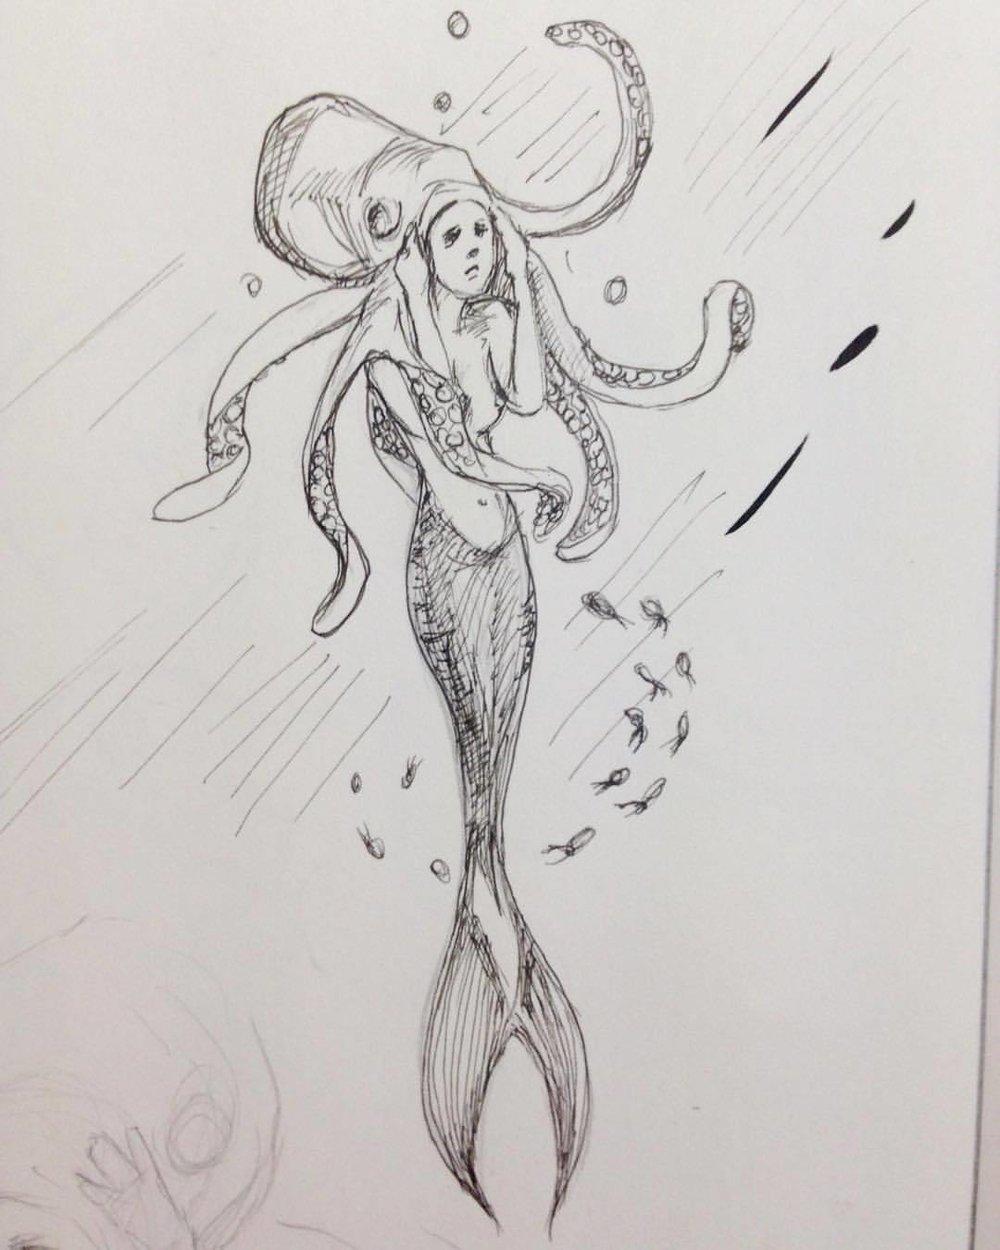 Mermaid fashion for the races 😉 #Inktober #ink #mermaid #day9 #belindaillustrates